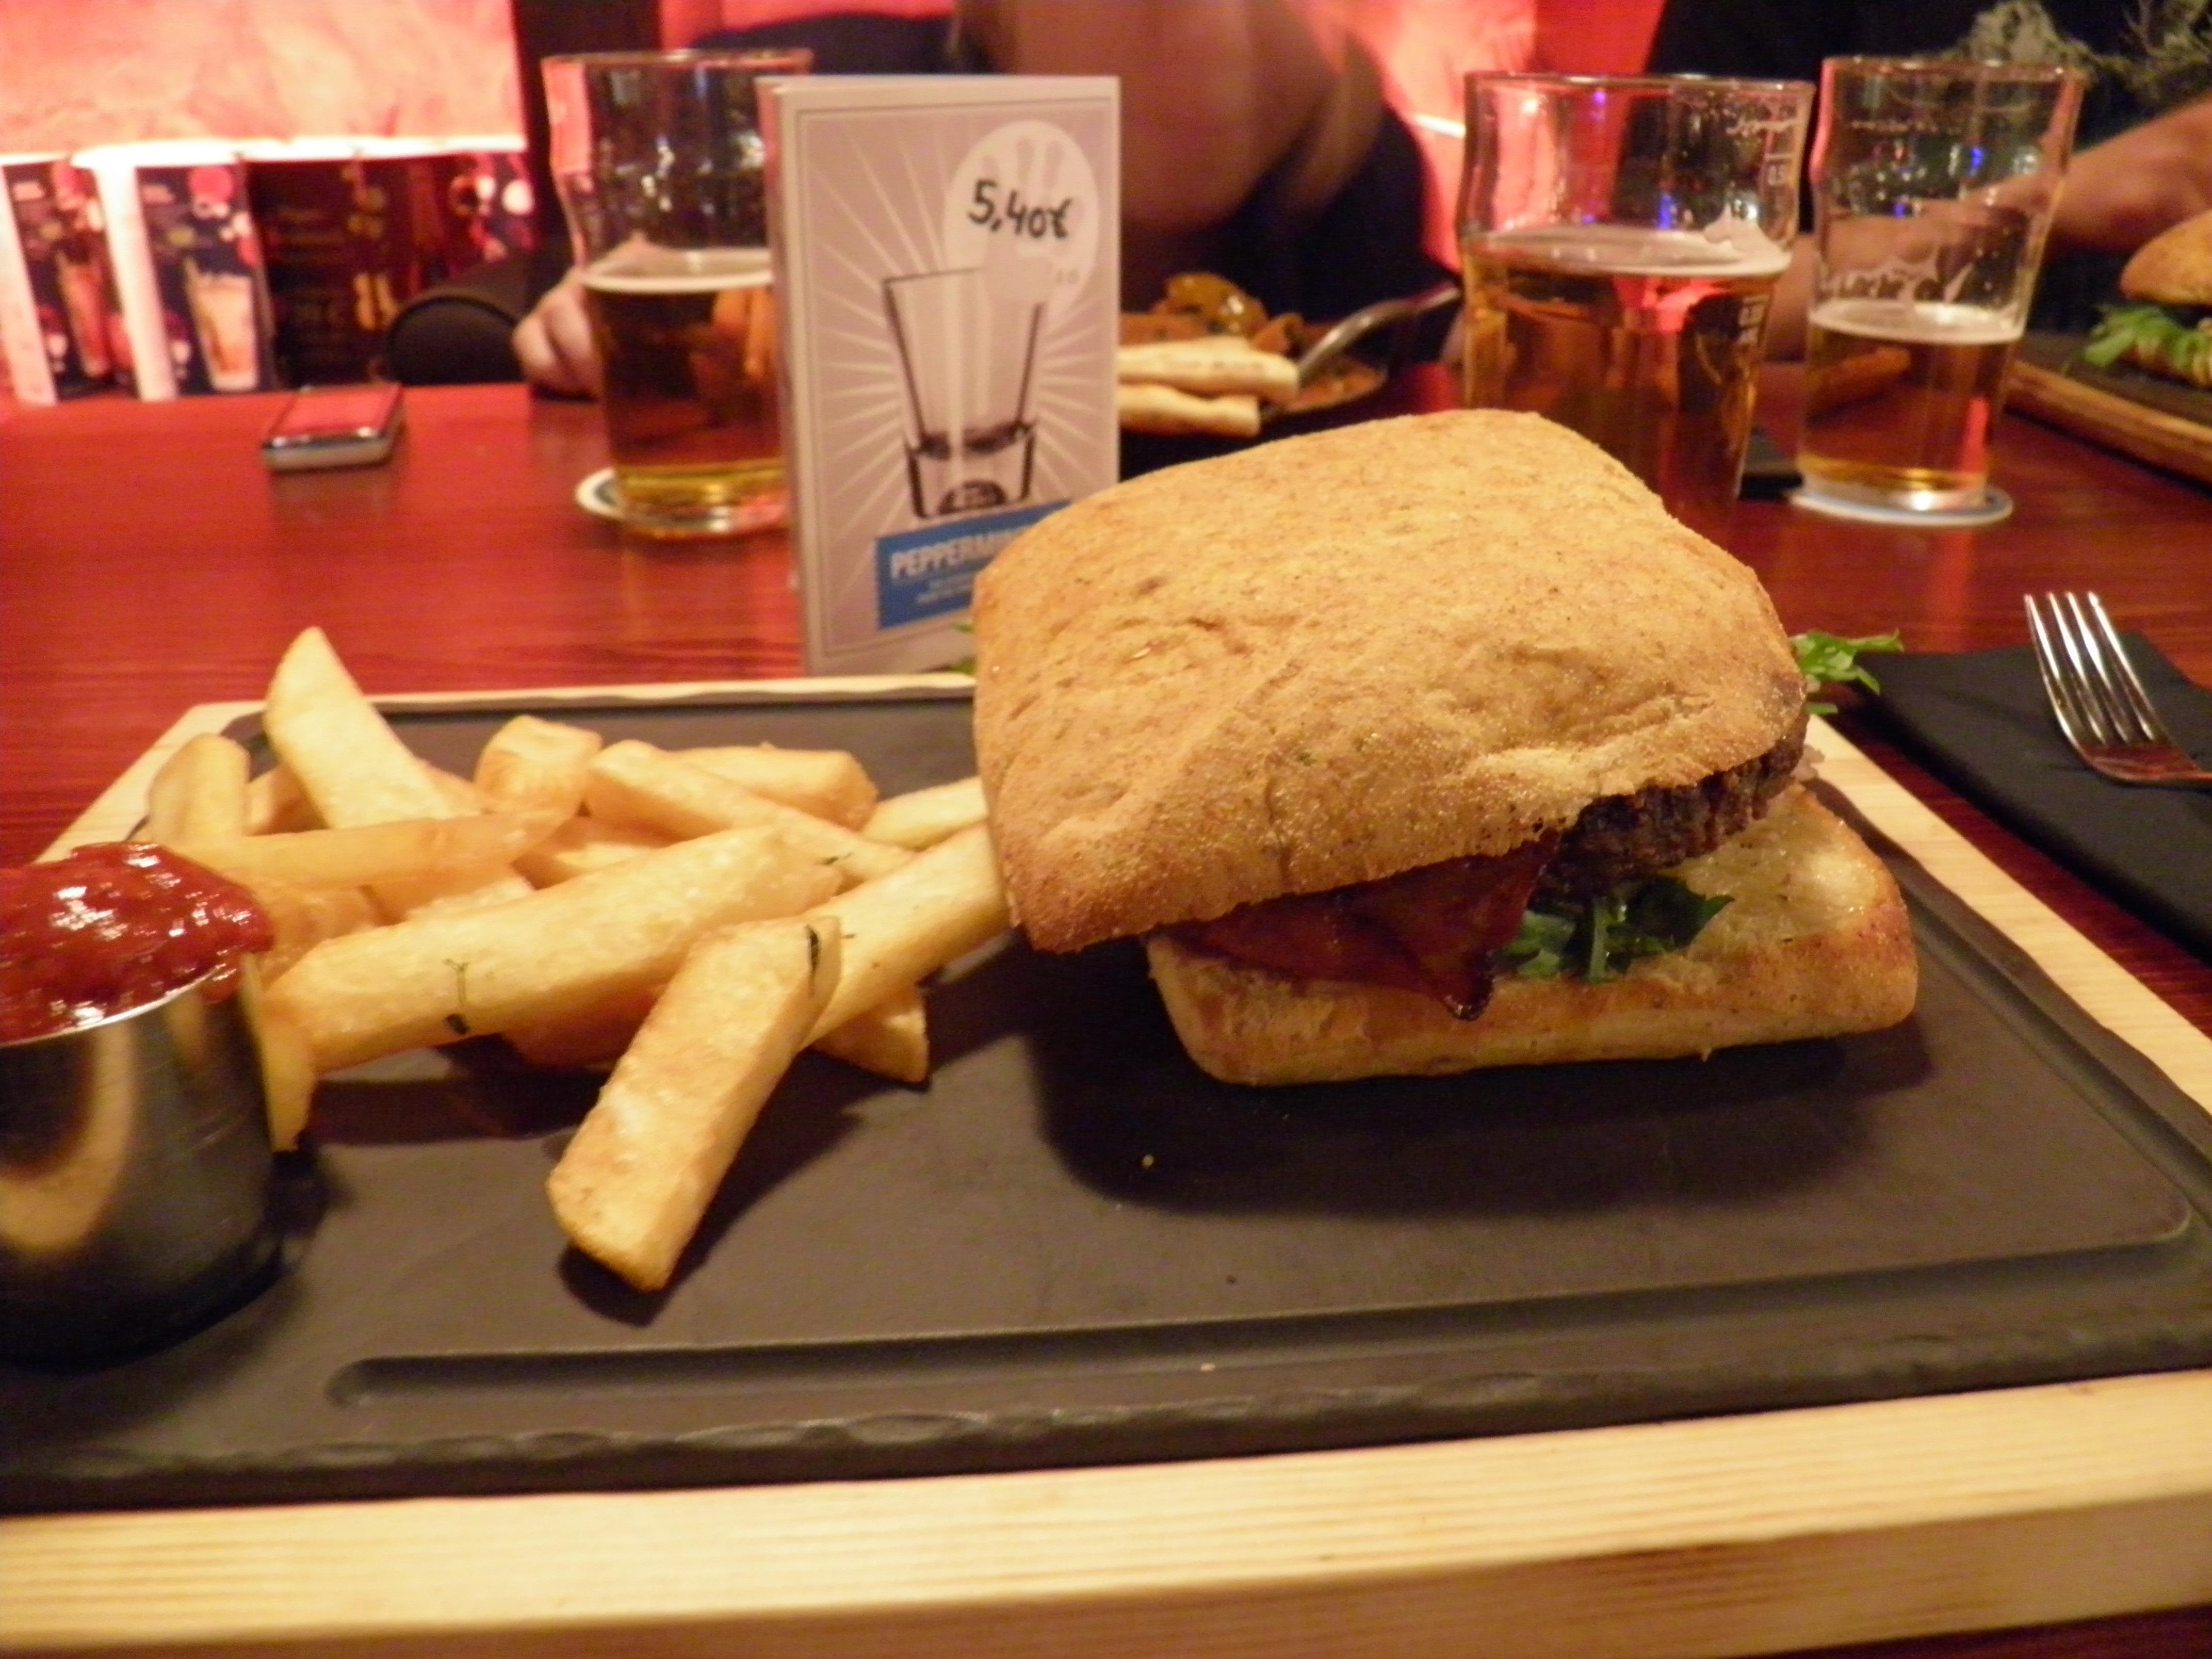 Stone's beer & burgers, Helsinki: Stone's burger